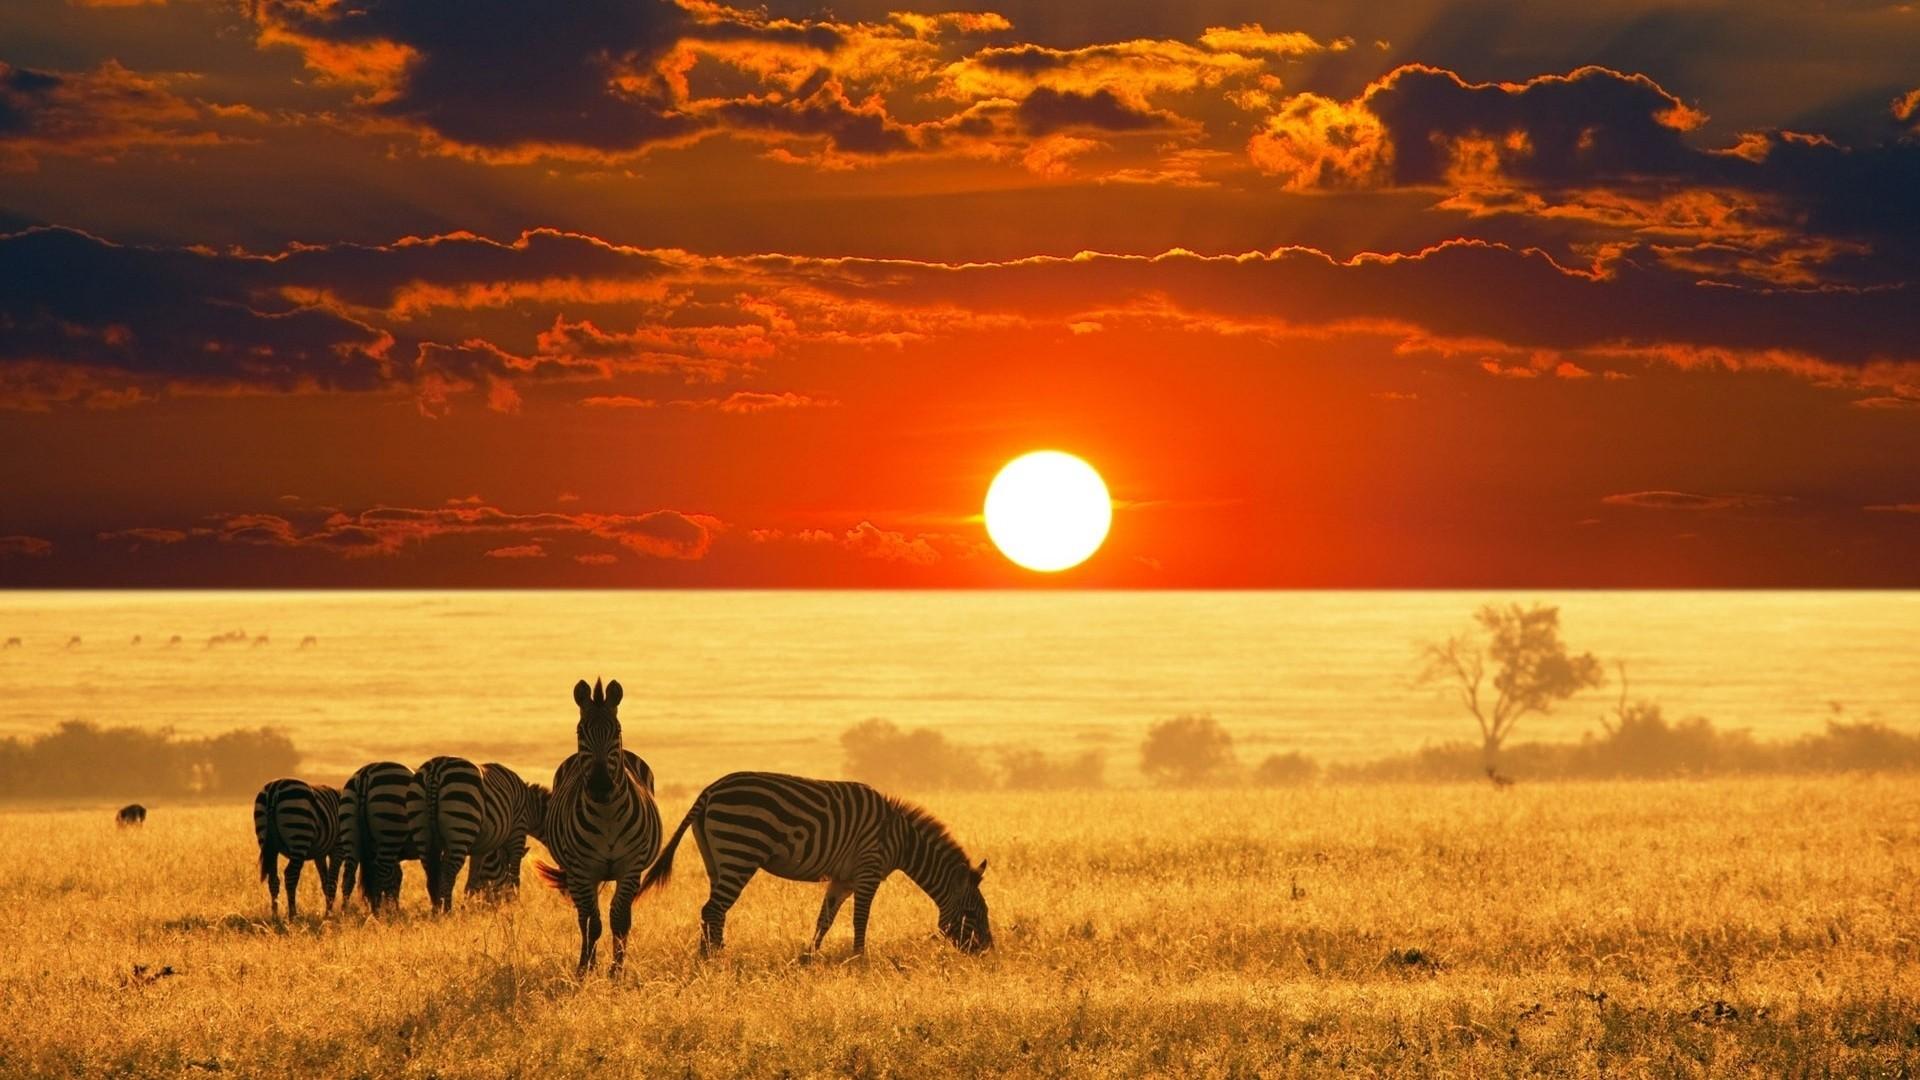 Africa hd wallpaper download